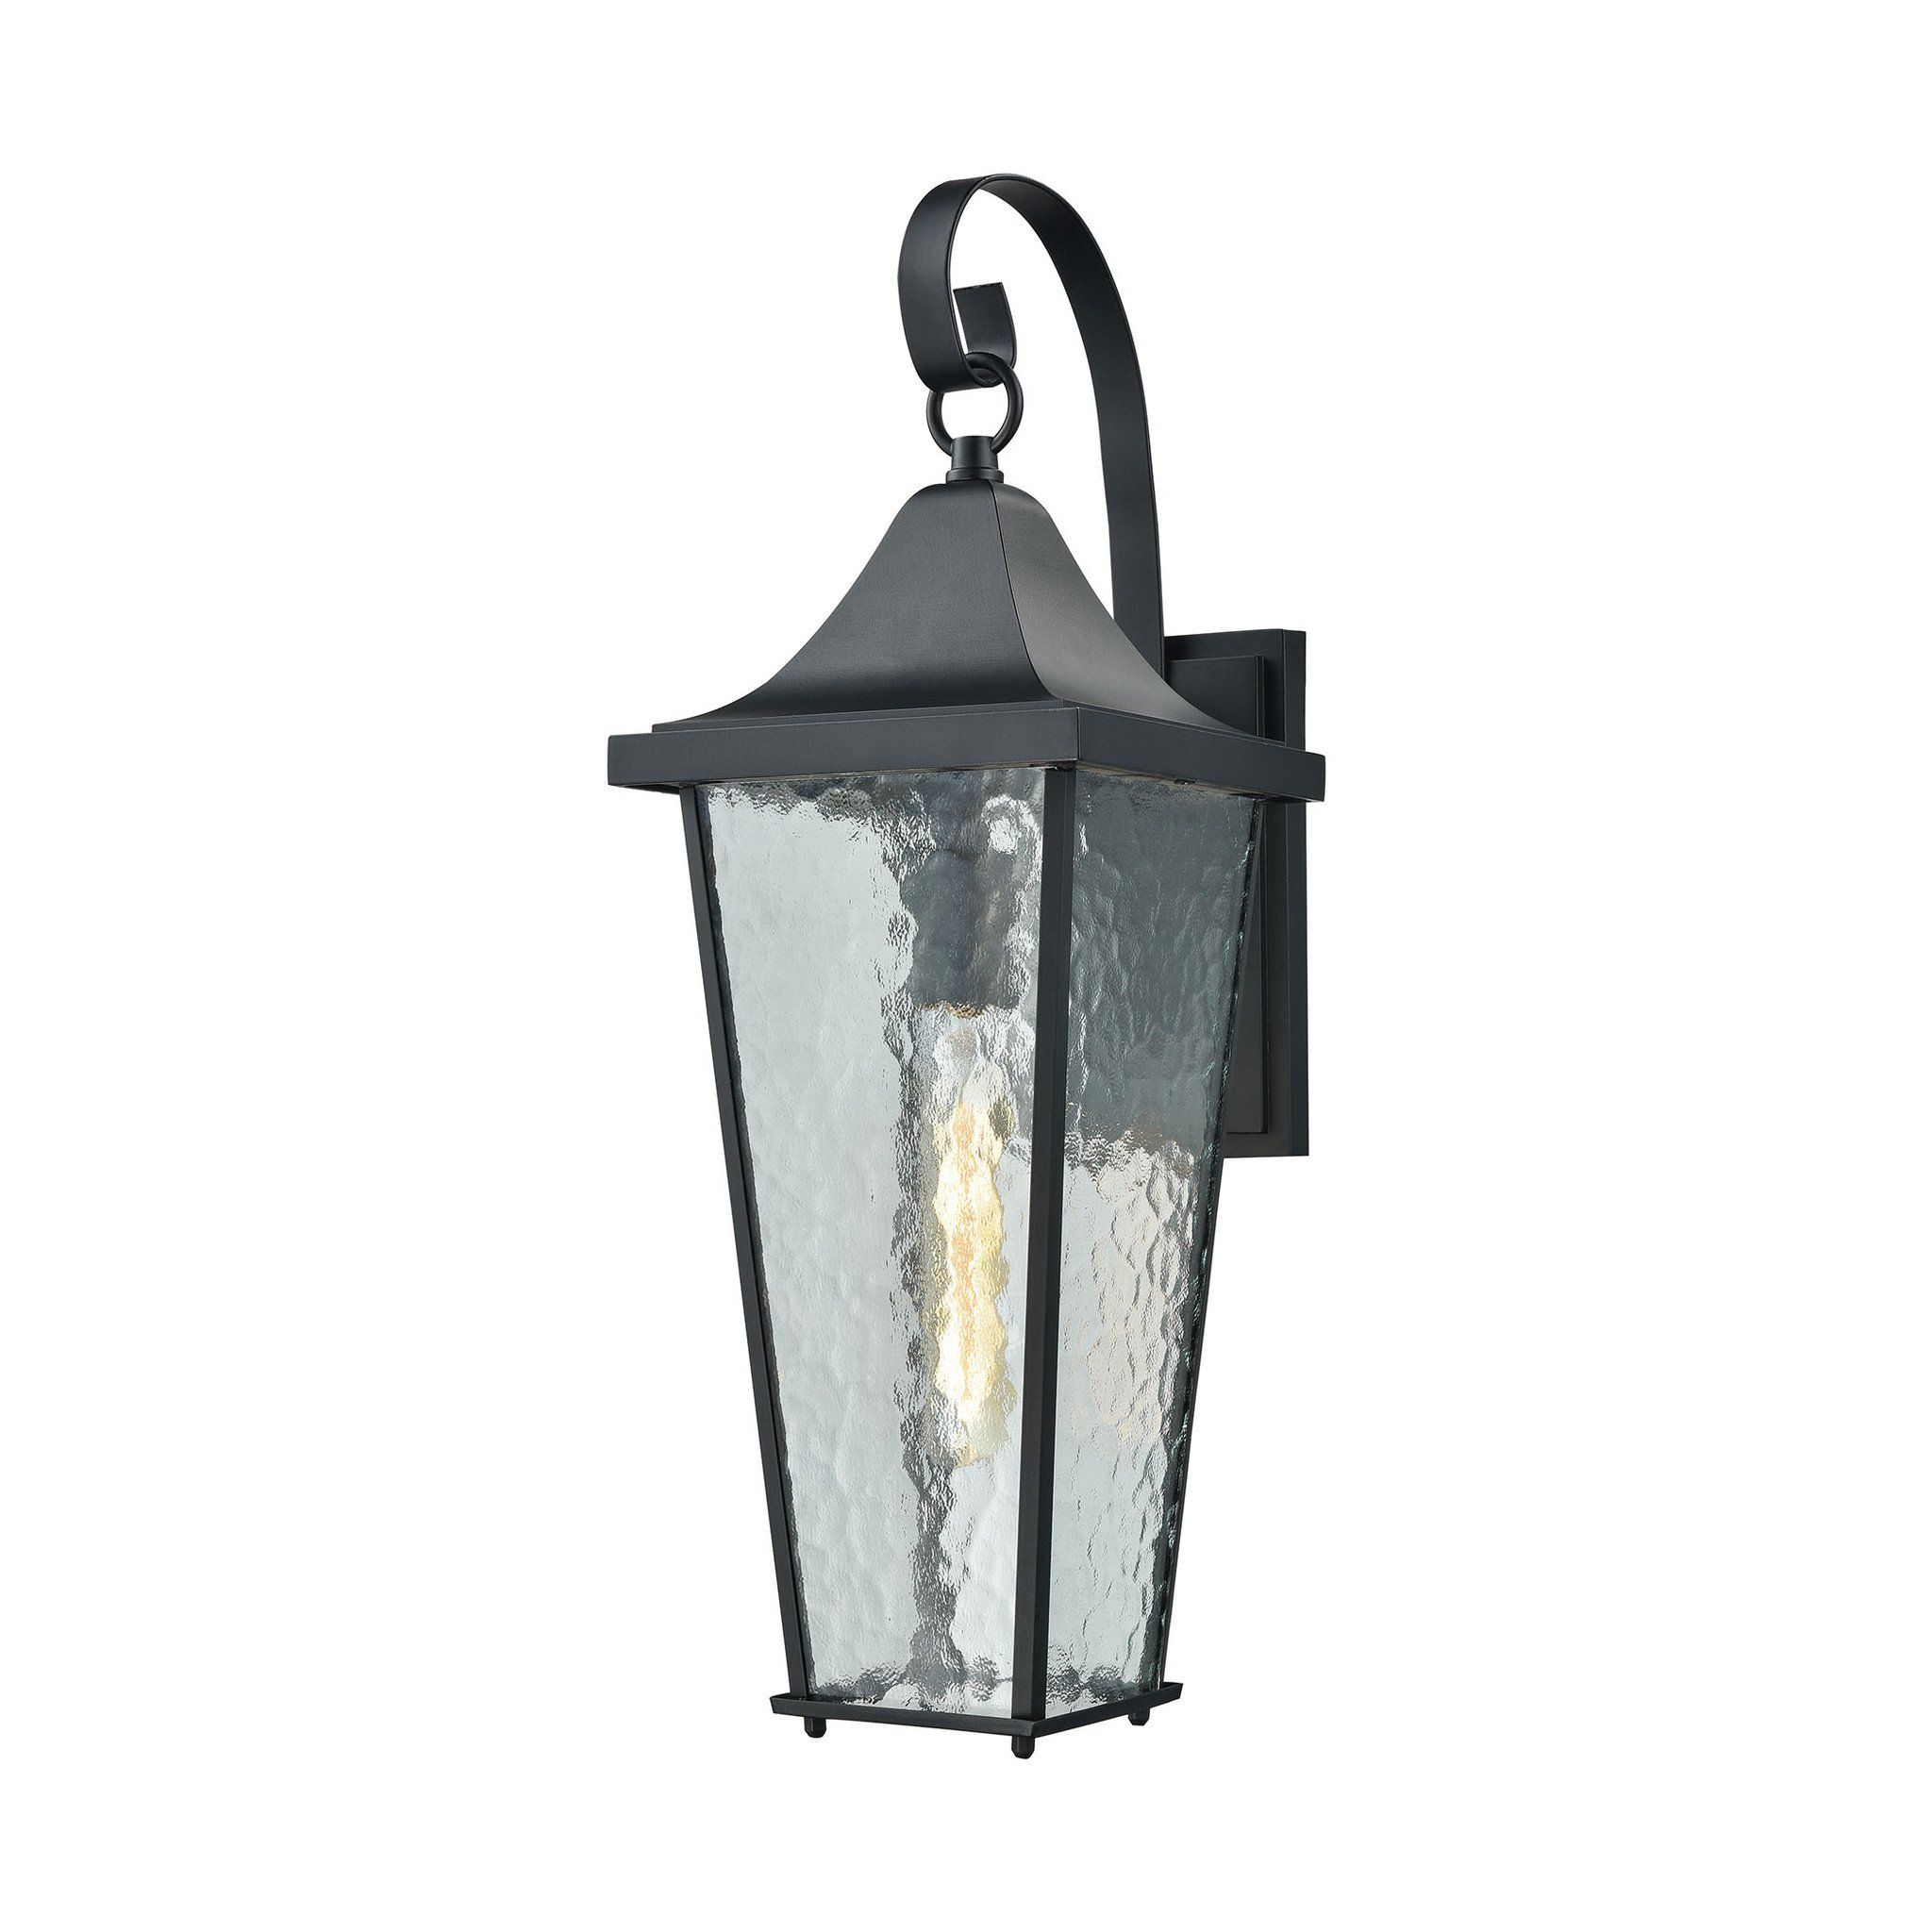 Elk lighting vinton collection matte black finish products